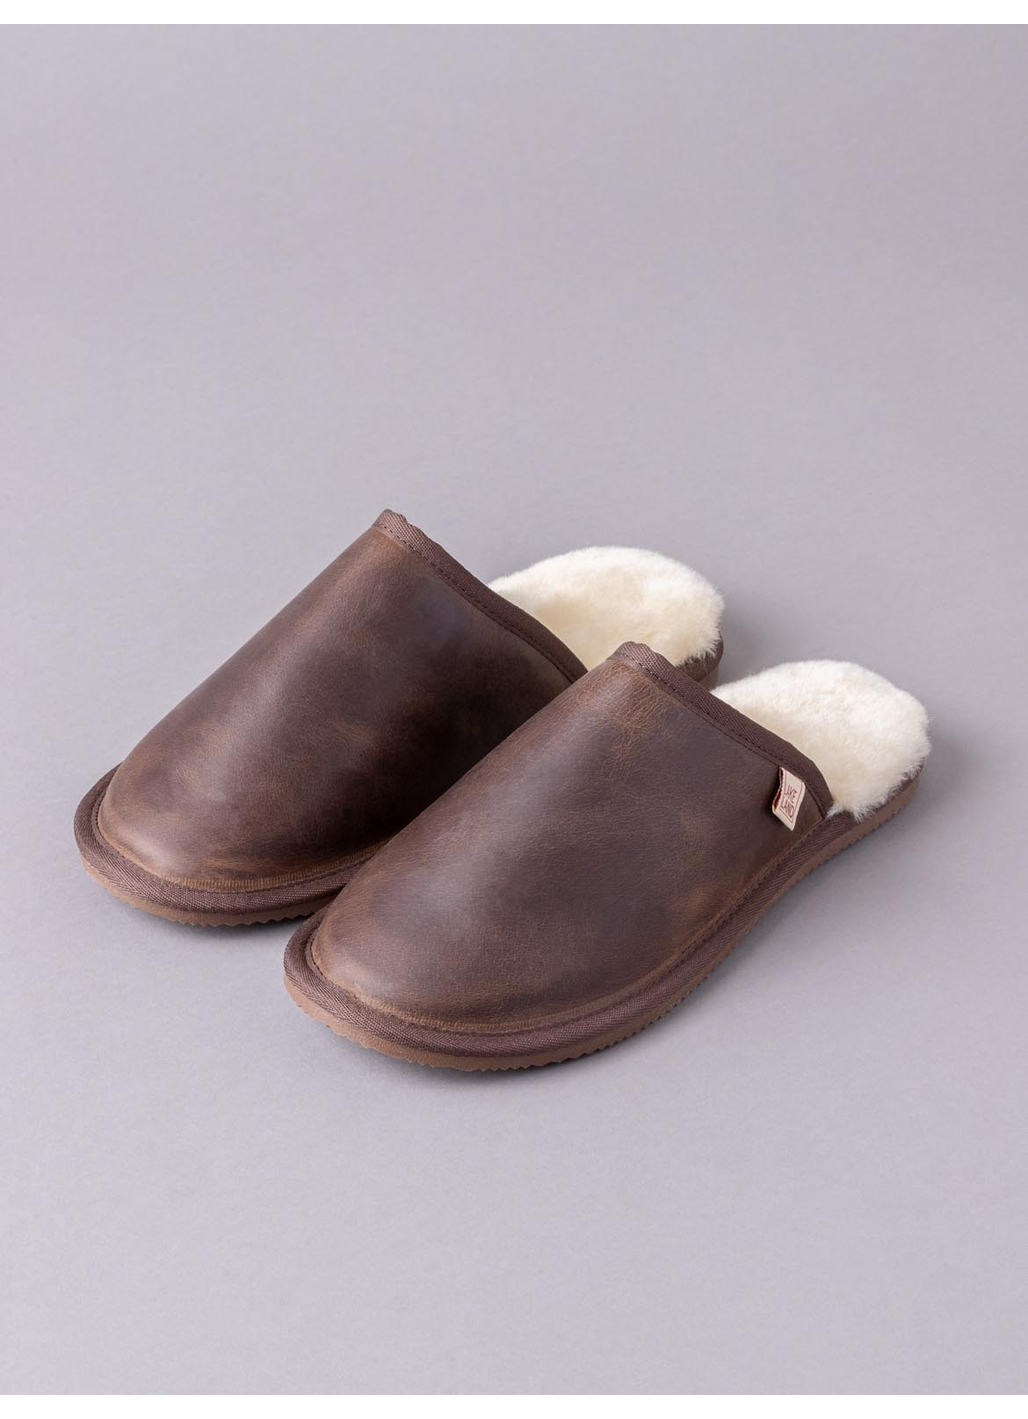 Men's Leather Sliders in Brown